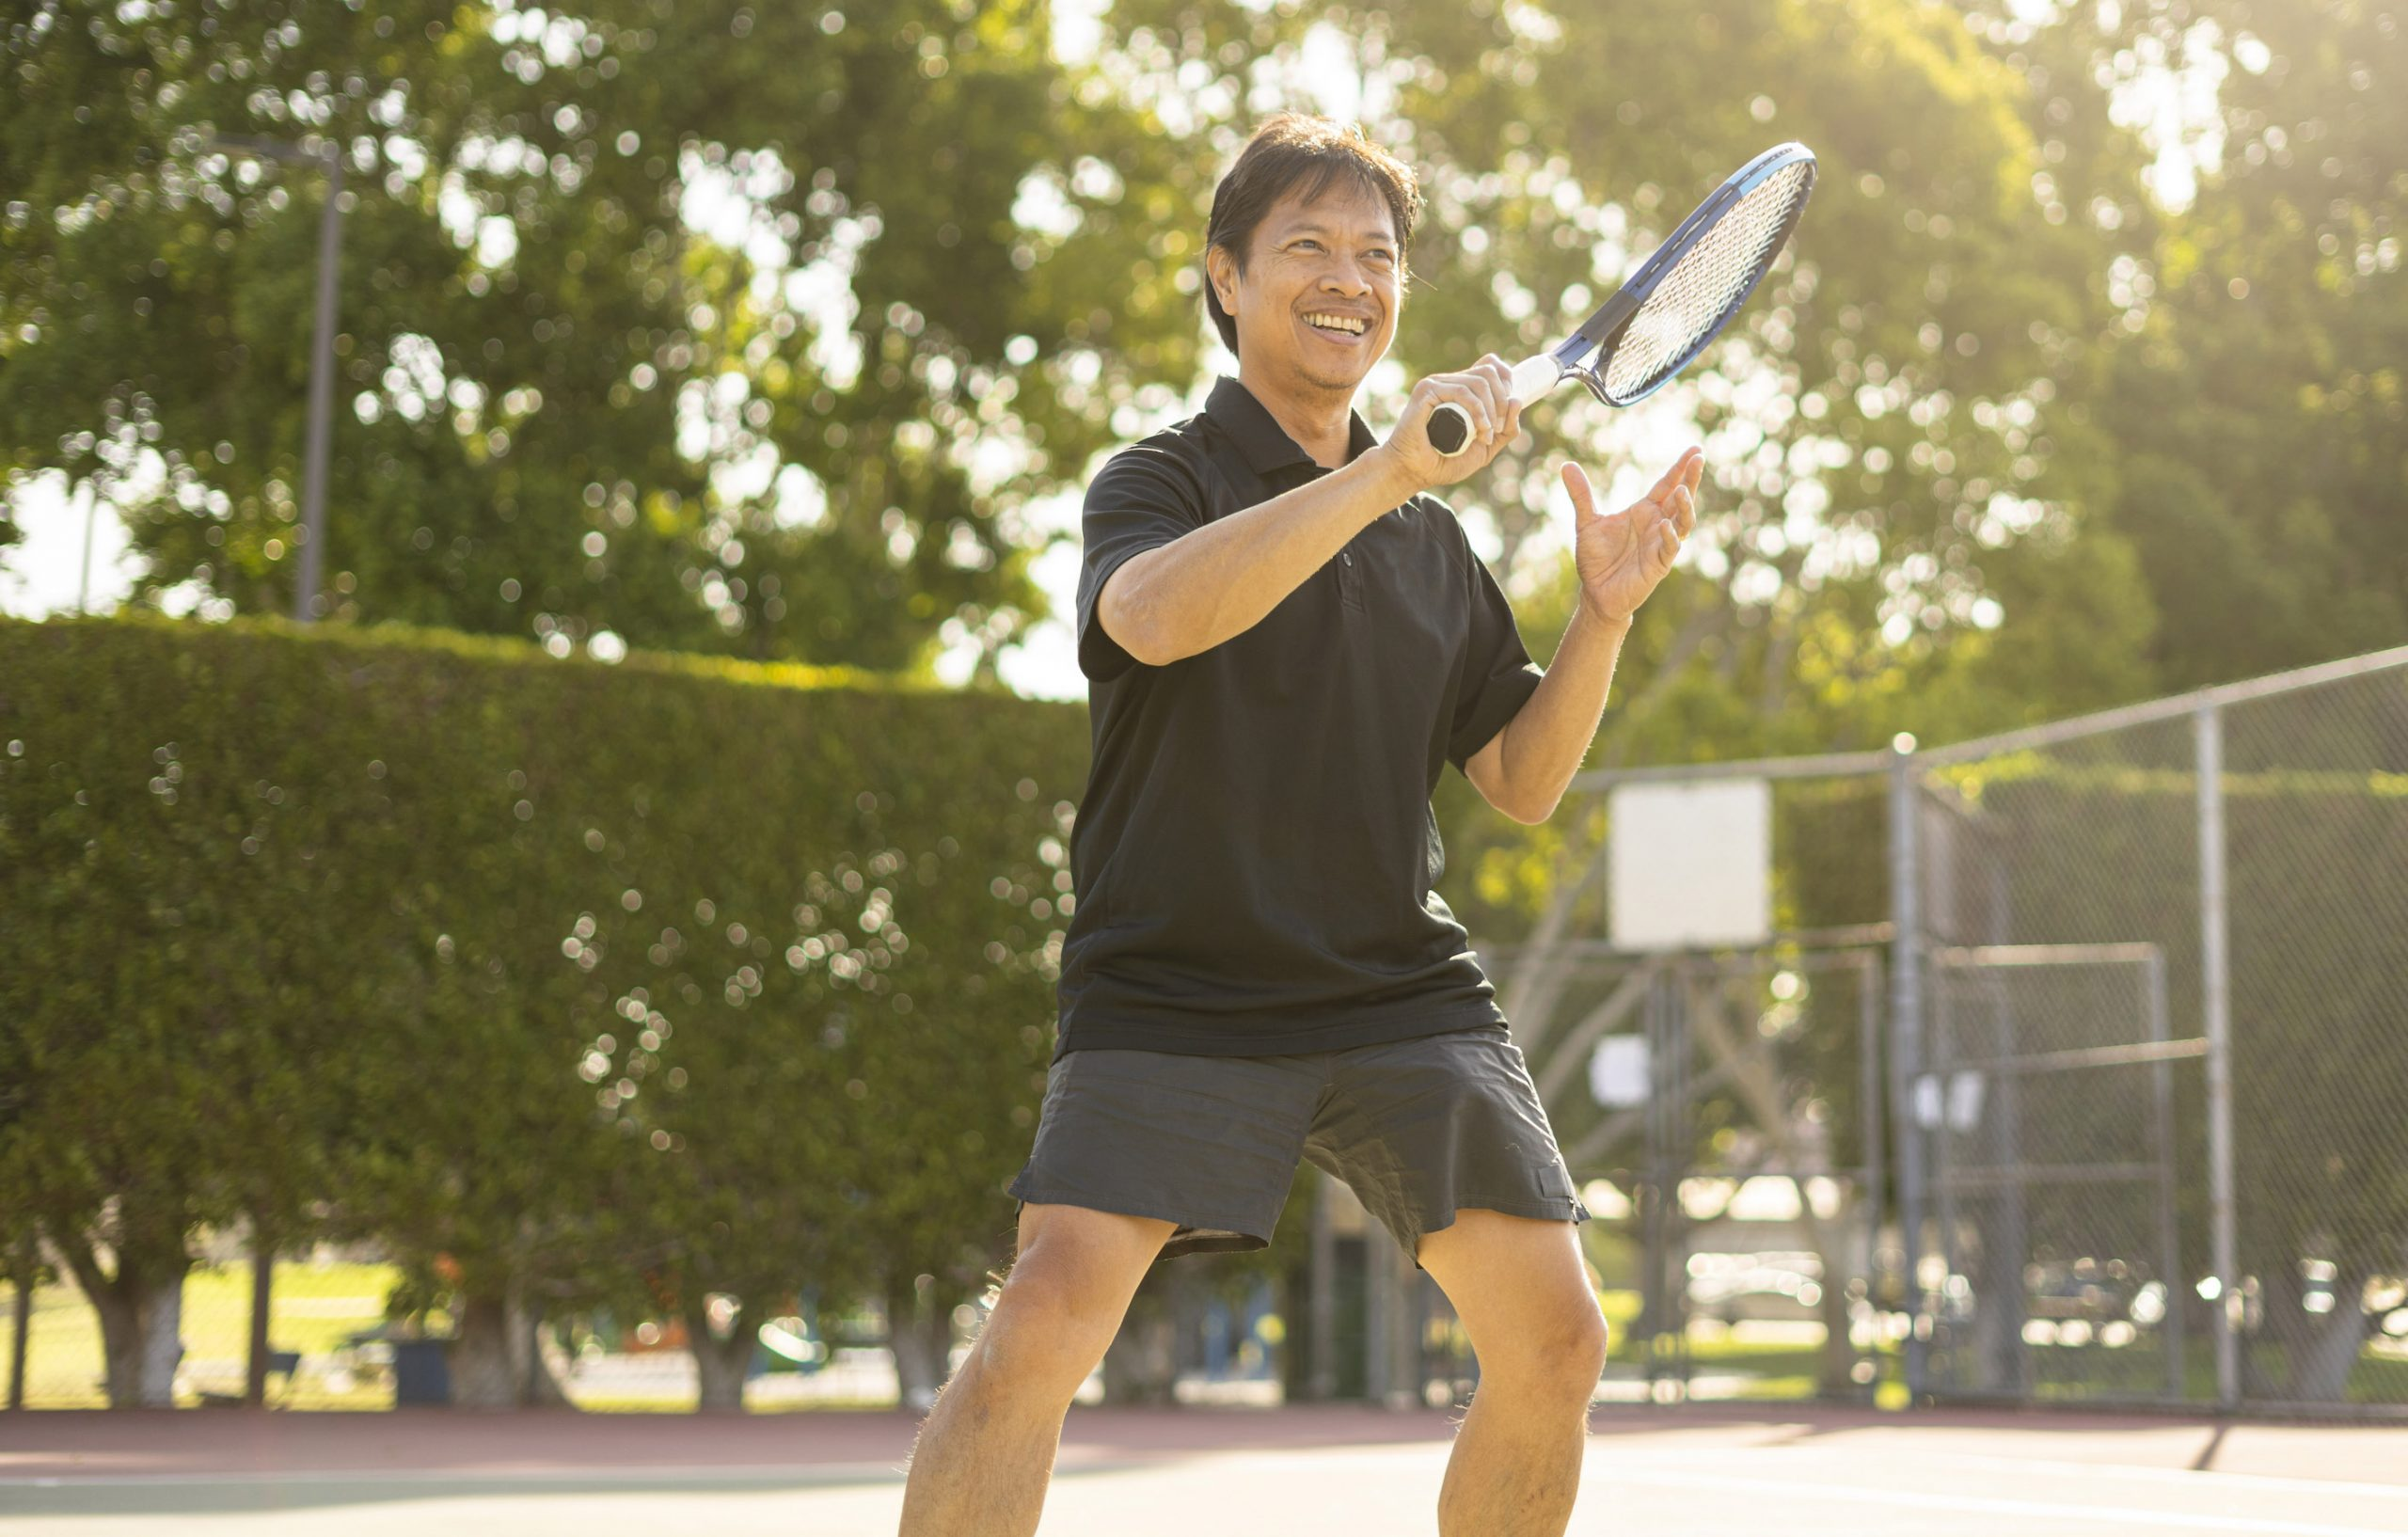 Mature man playing tennis hitting the ball closeup